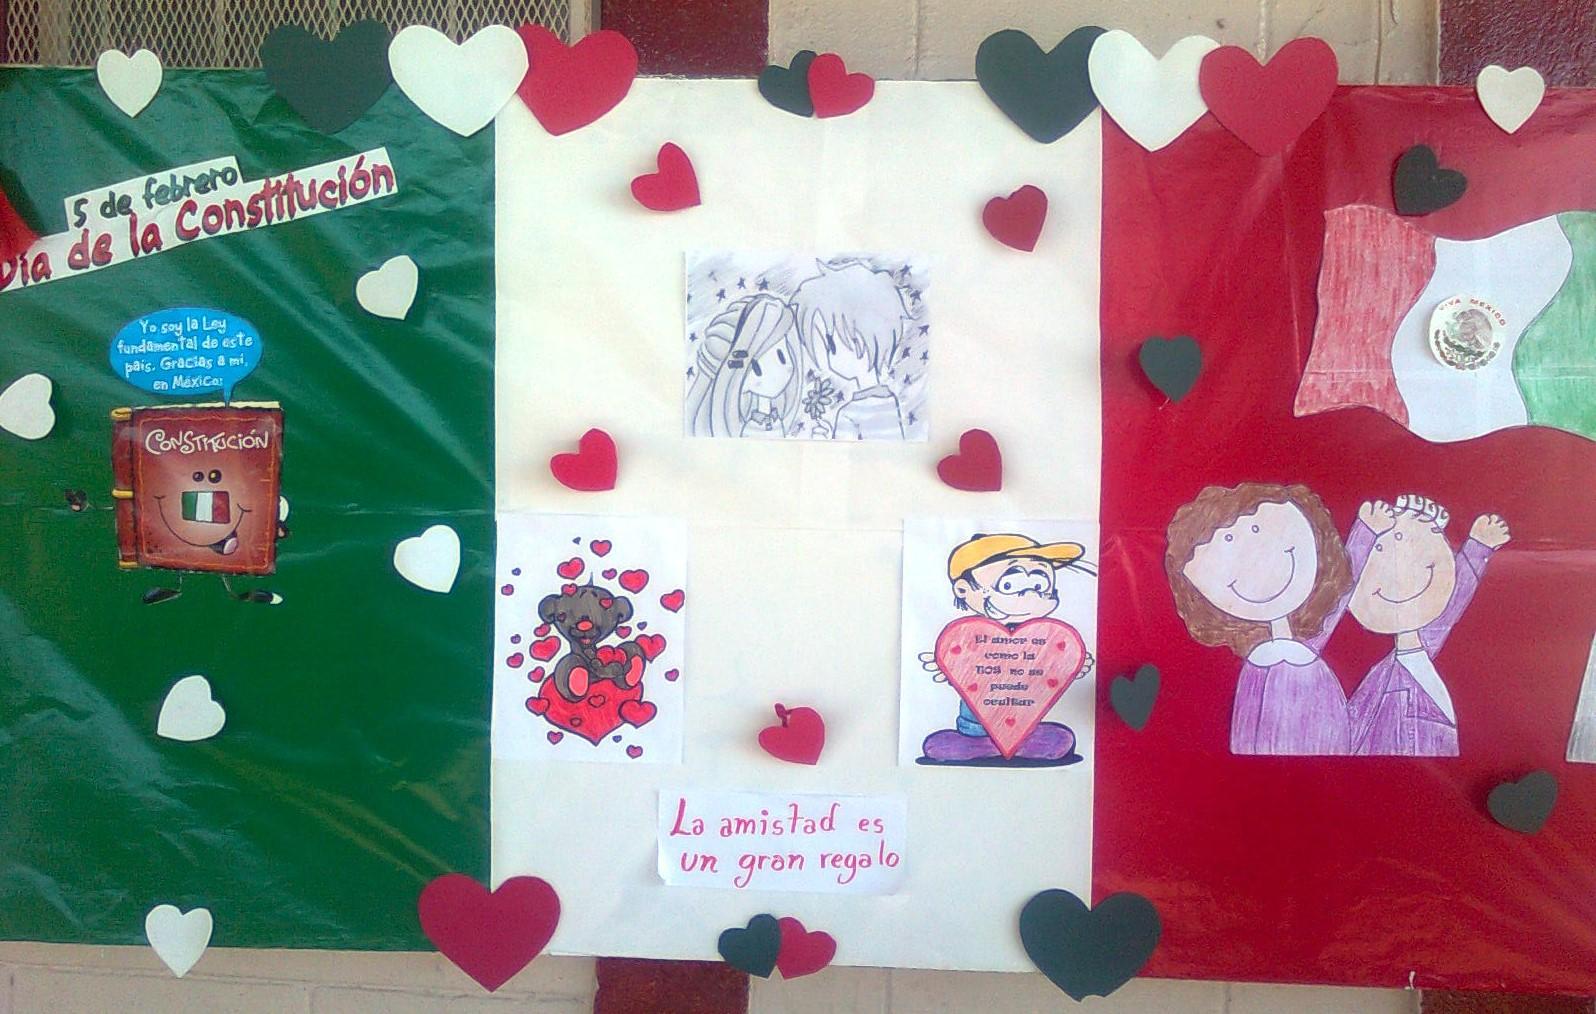 Periodico mural febrero 4 imagenes educativas for Concepto de periodico mural